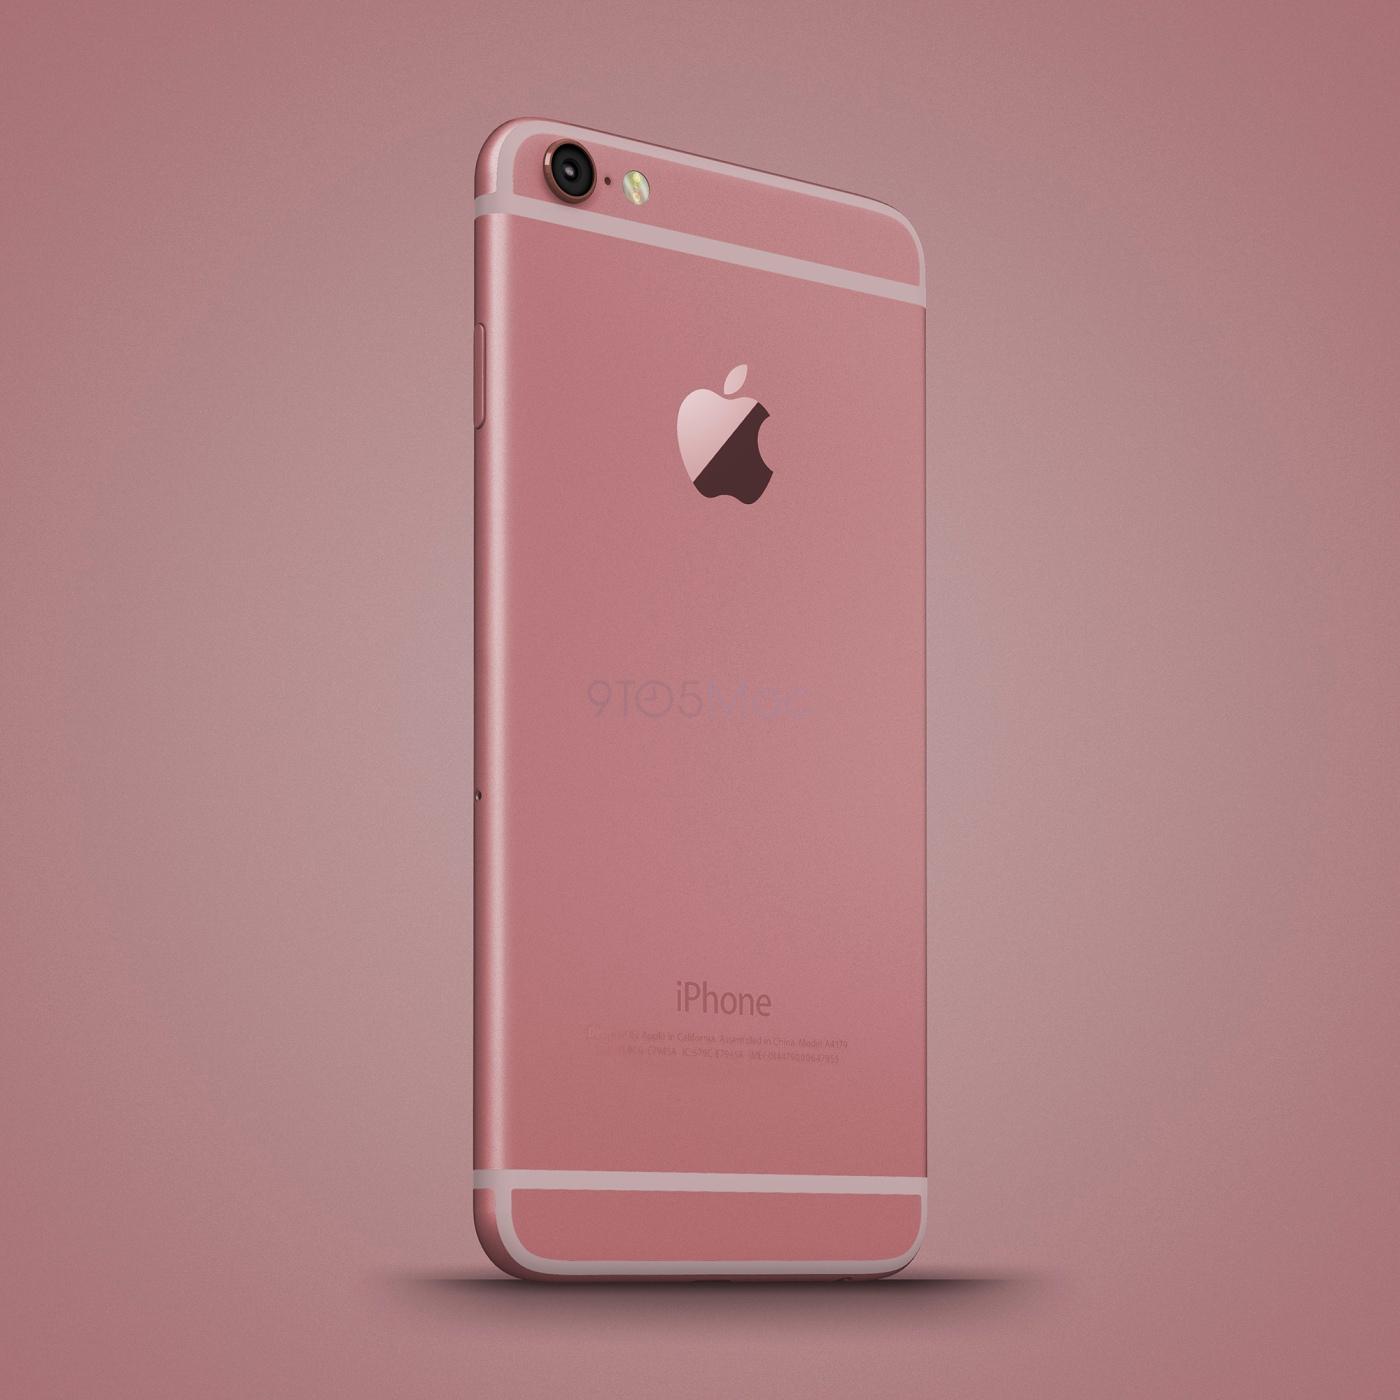 iphone-6c-rosegold_rear